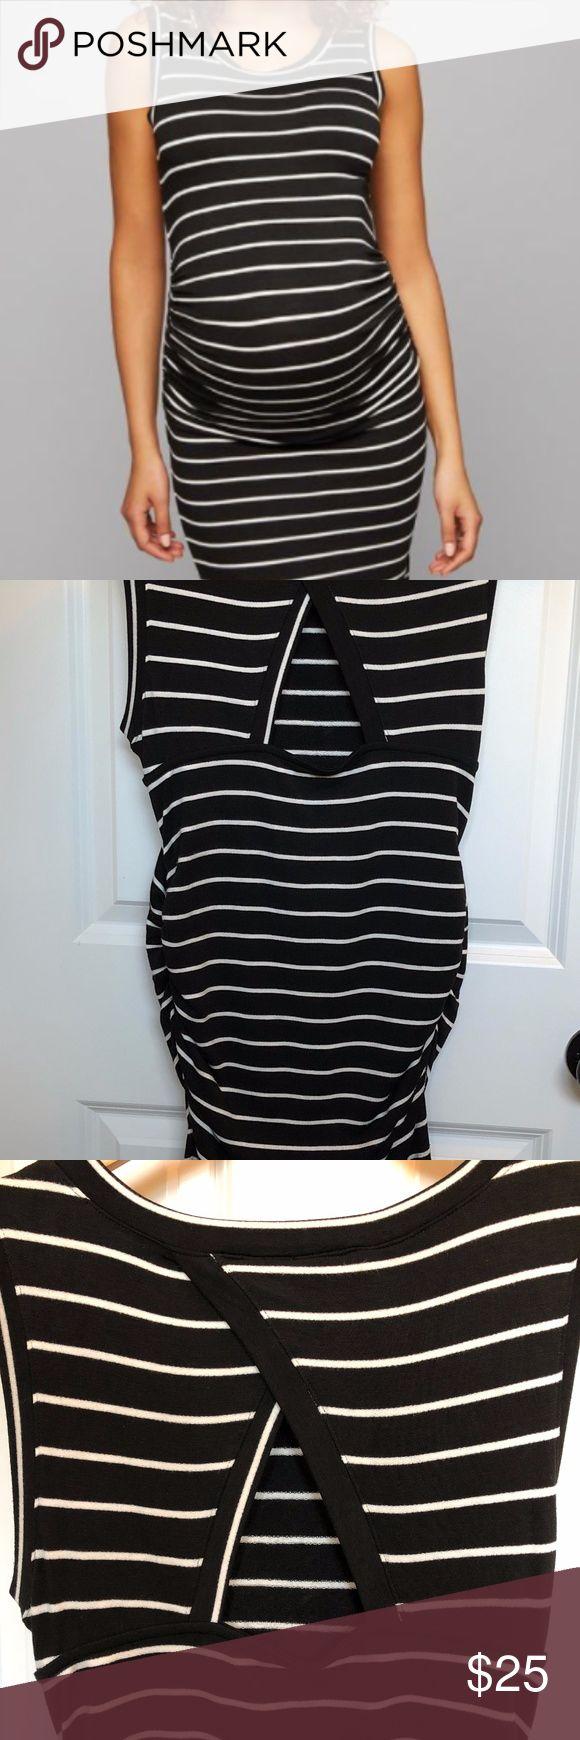 Best 20 striped maternity dresses ideas on pinterest summer a pea in the pod striped maternity dress medium ombrellifo Gallery